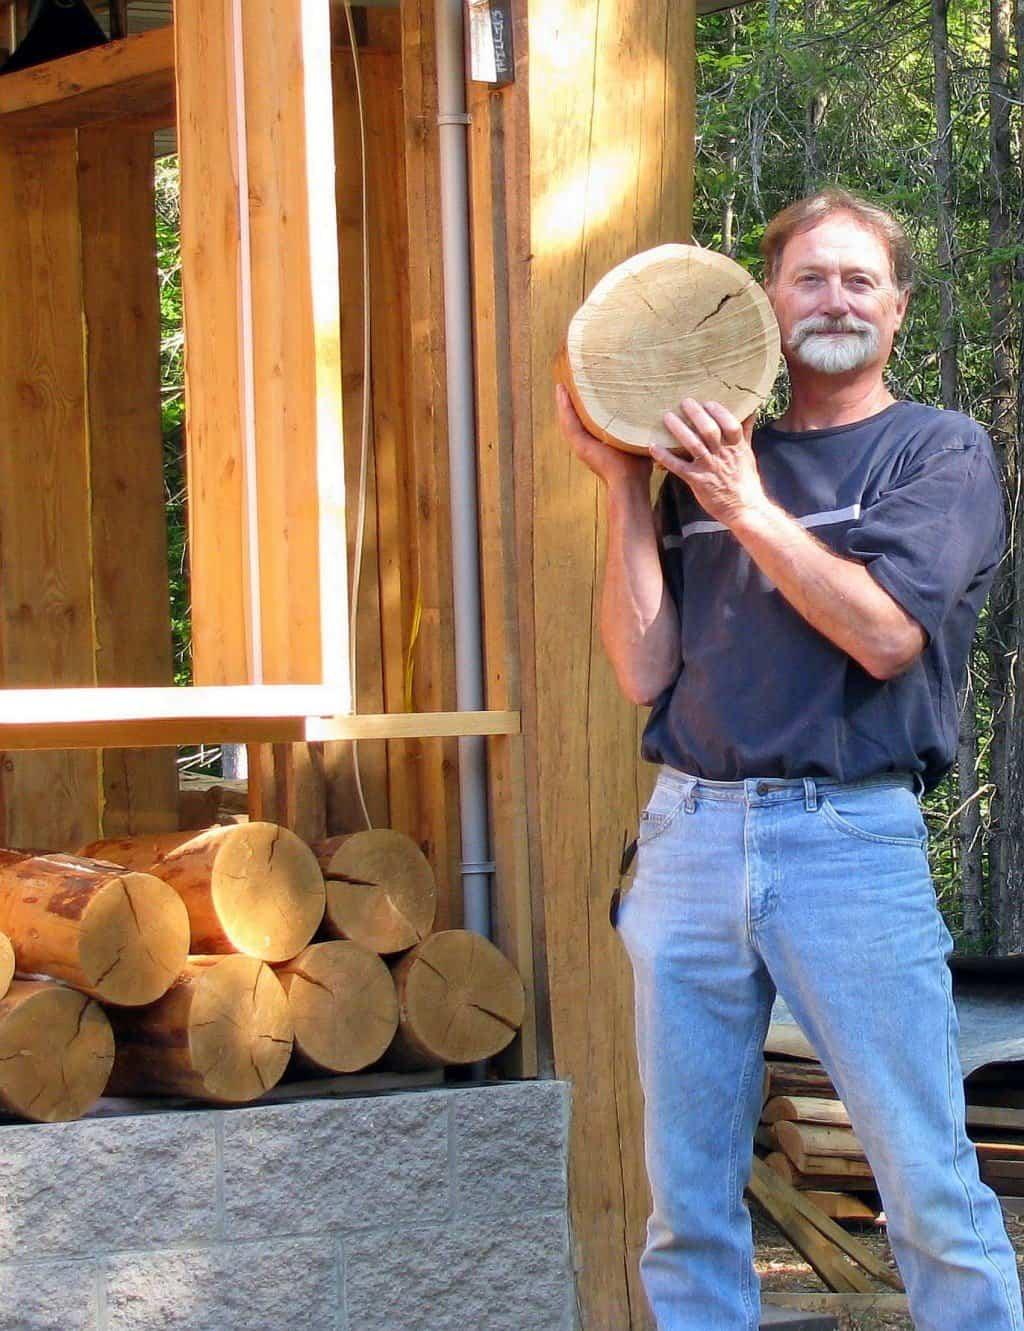 suelo con discos de madera - conseguir troncos redondos